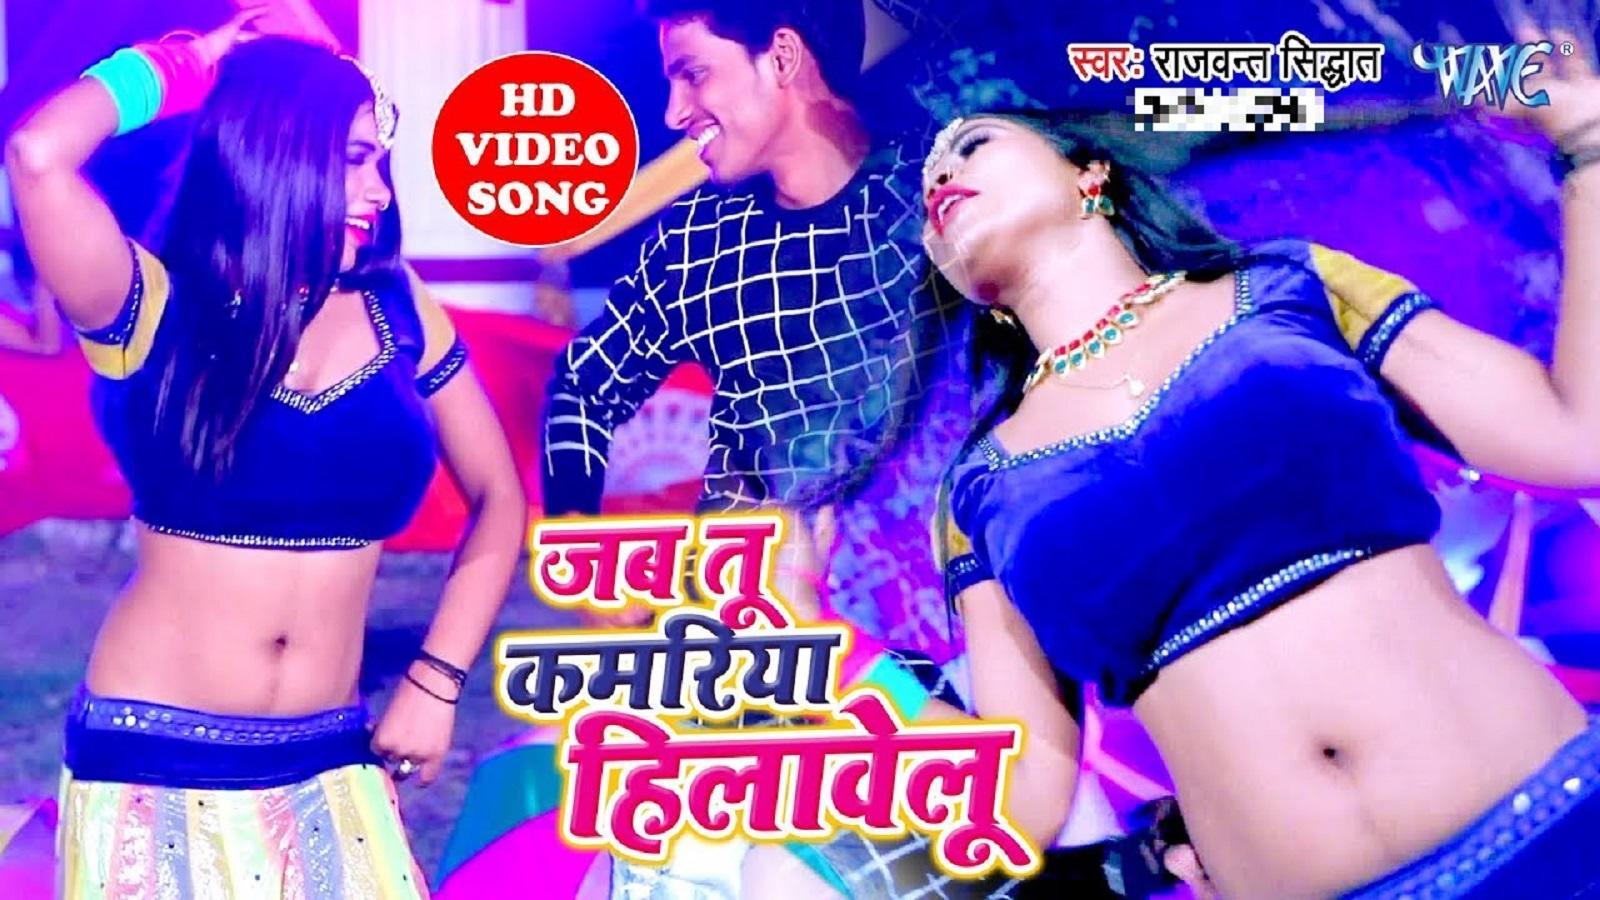 Latest Bhojpuri song 'Jab Tu Kamariya Hilawelu' from 'Kamariya Hilawelu'  sung by Rajwant Siddhant